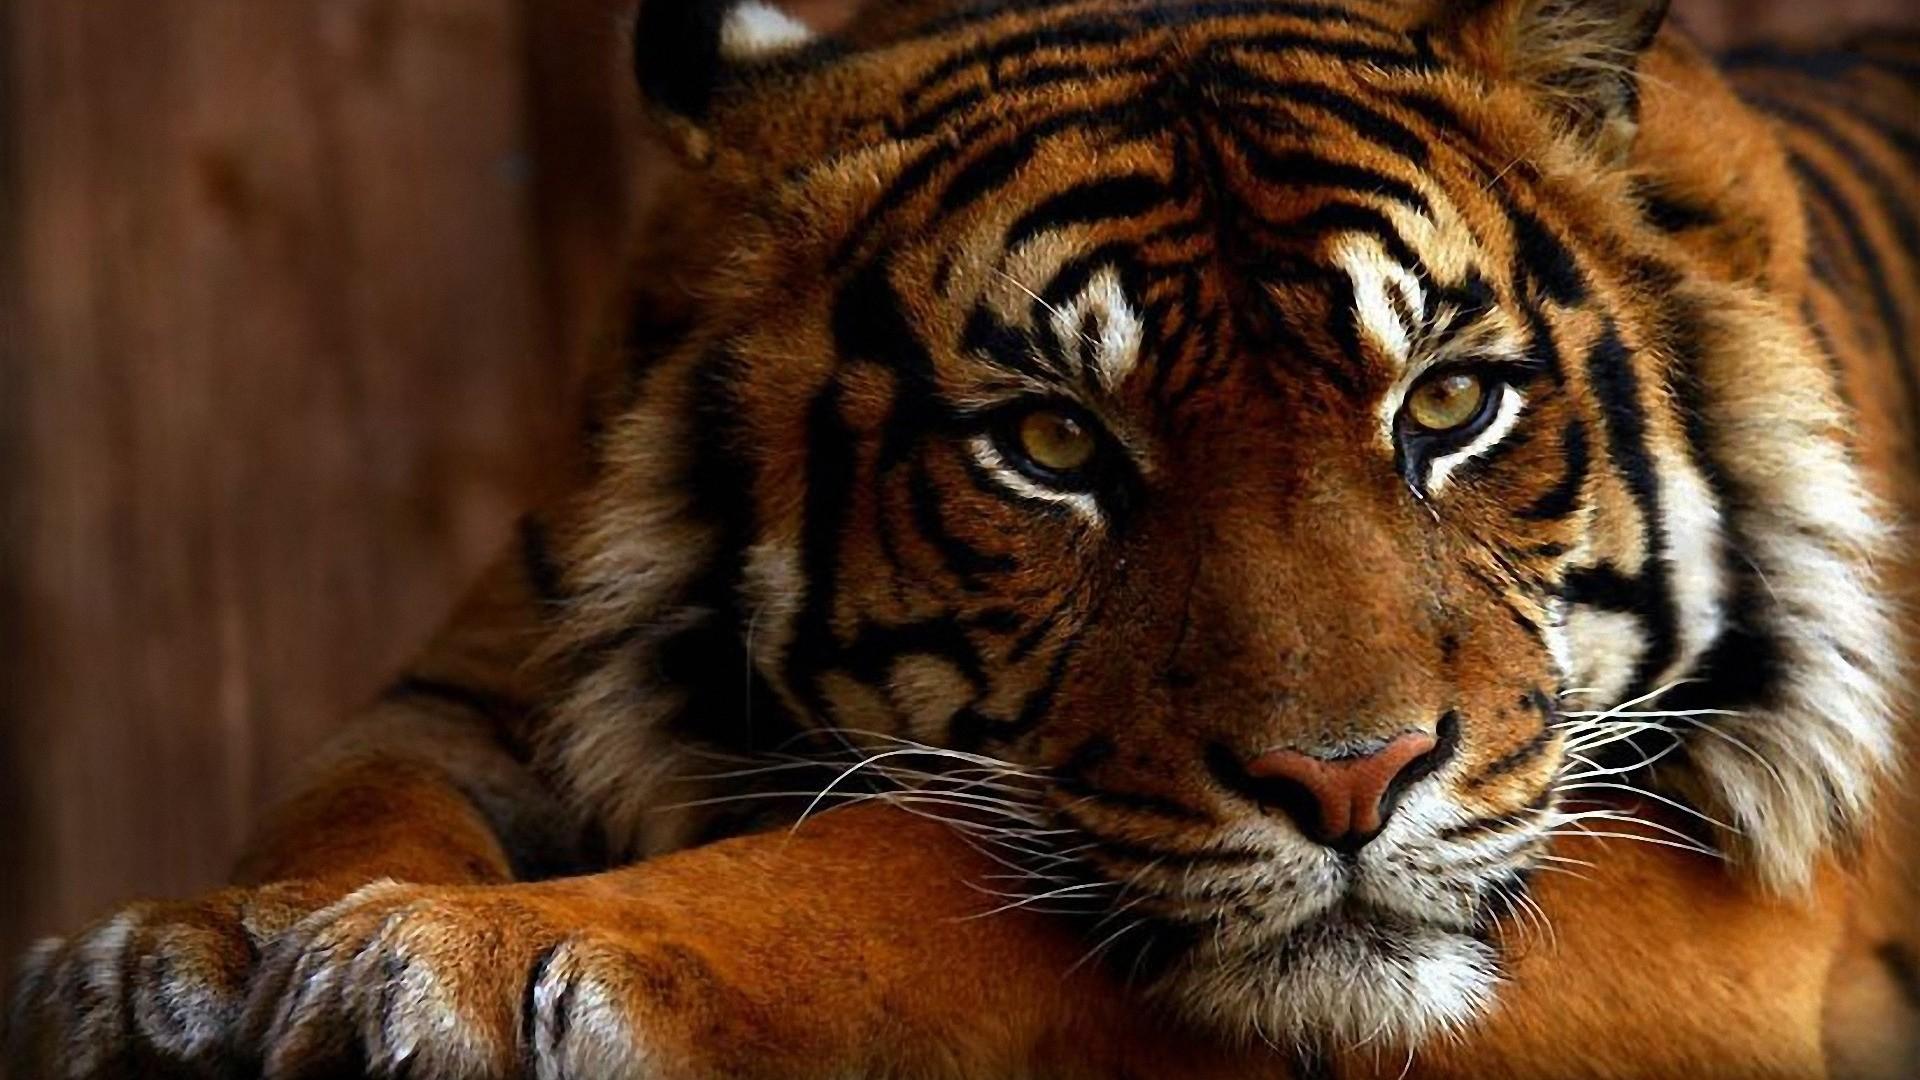 Bengal Tiger Wallpaper Full HD.